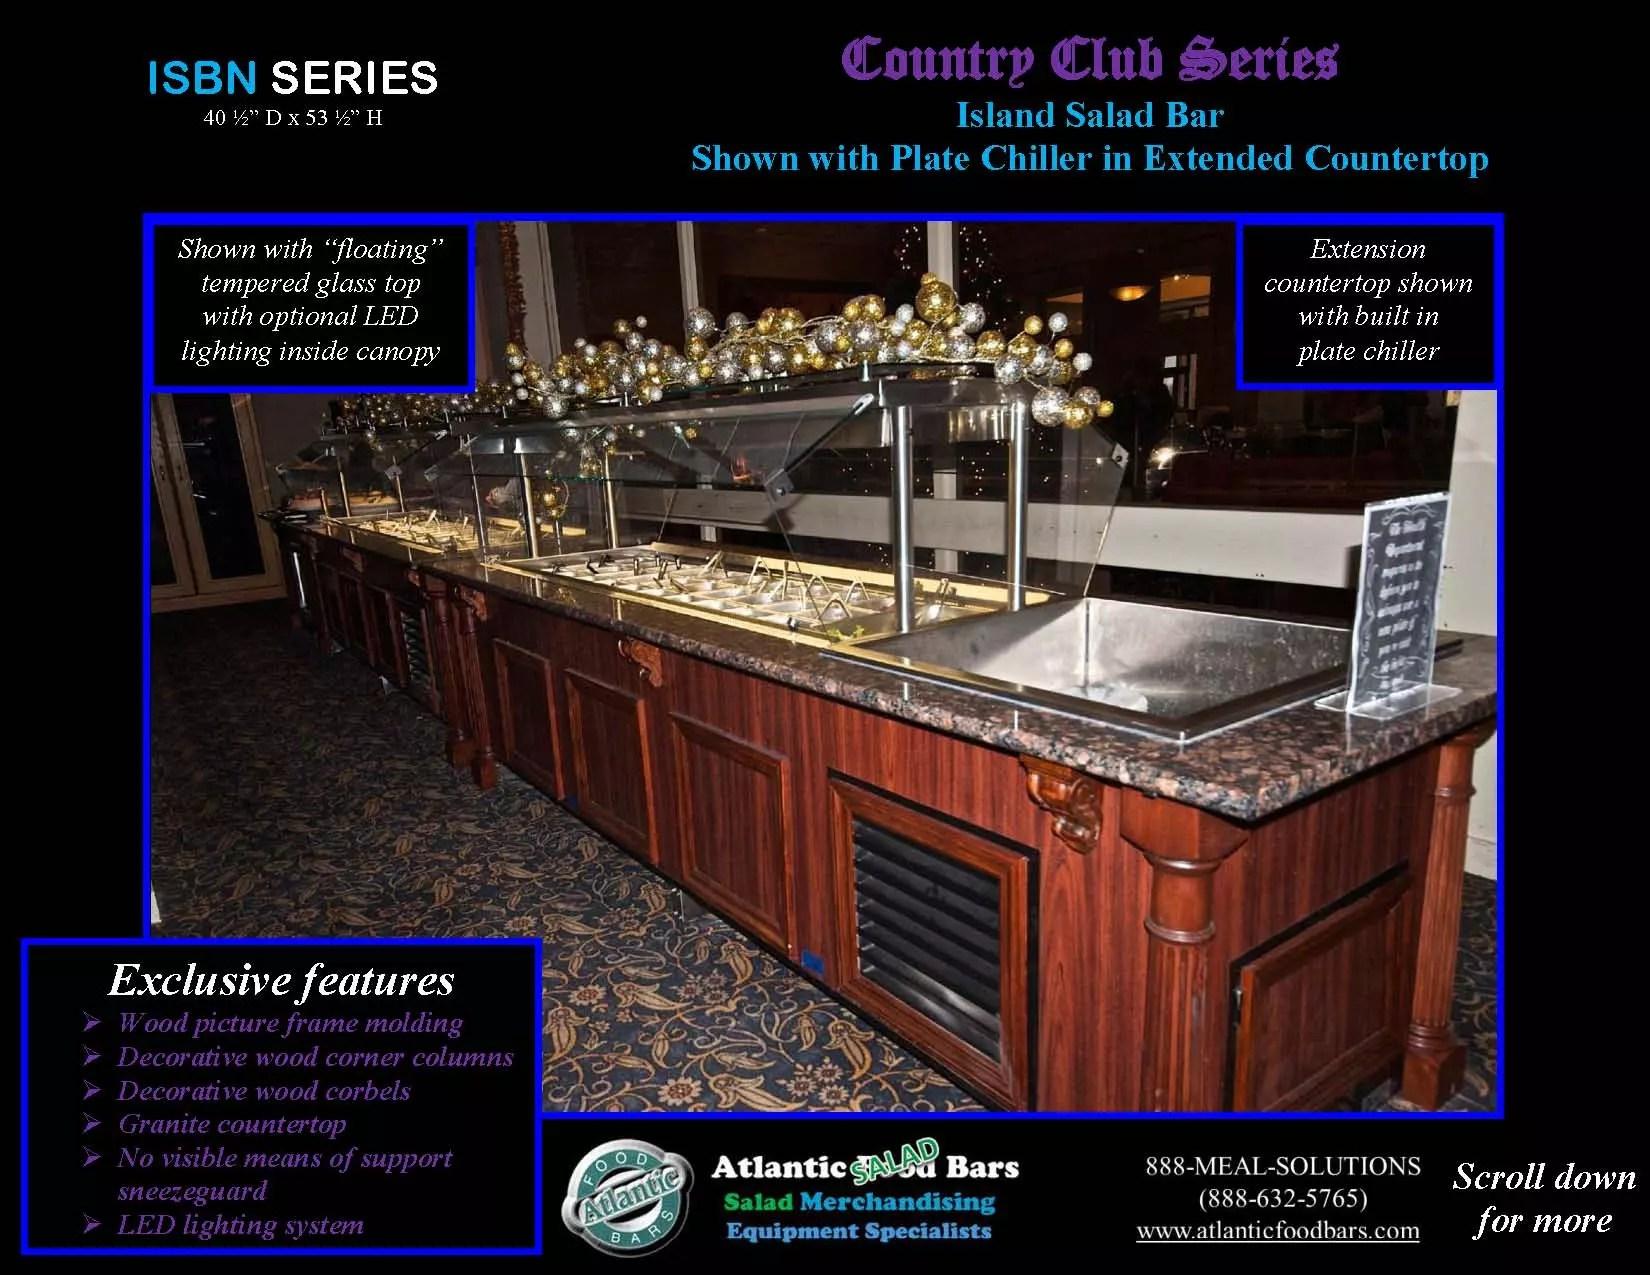 Atlantic Food Bars - Country Club Series Island Salad Bar | The ...